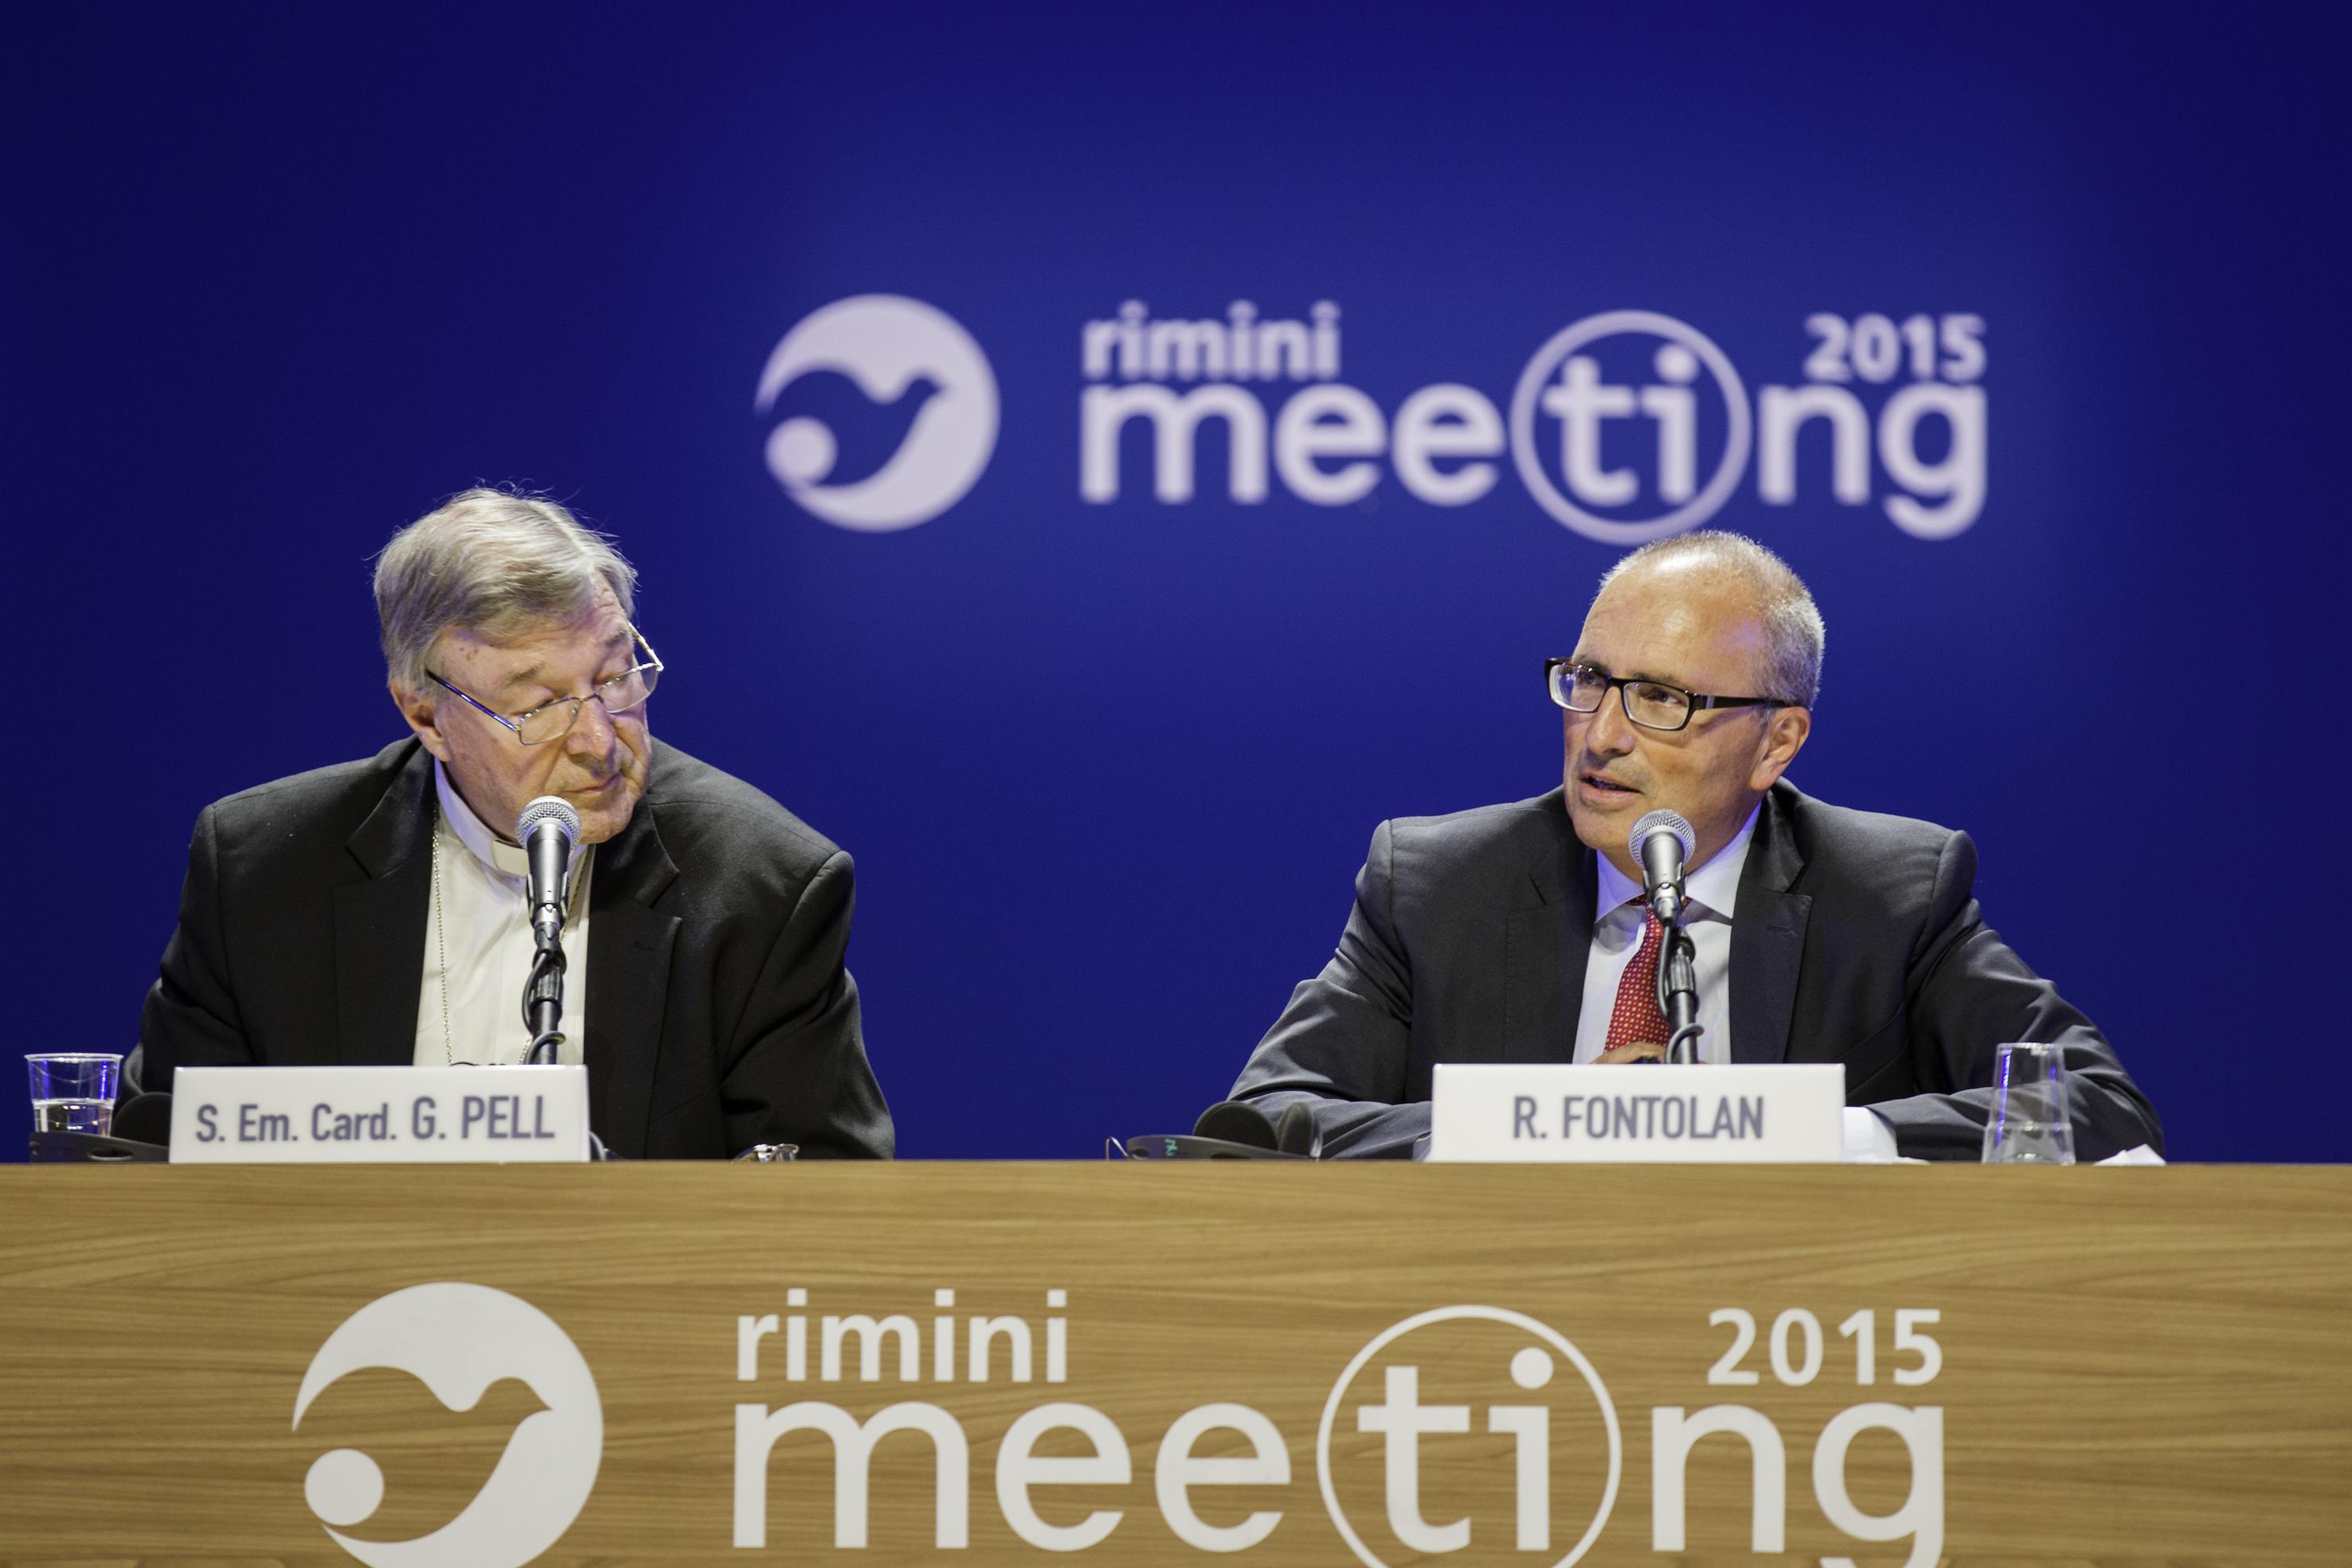 Cardinal George Pell (L) at the Meeting of Rimini 2015